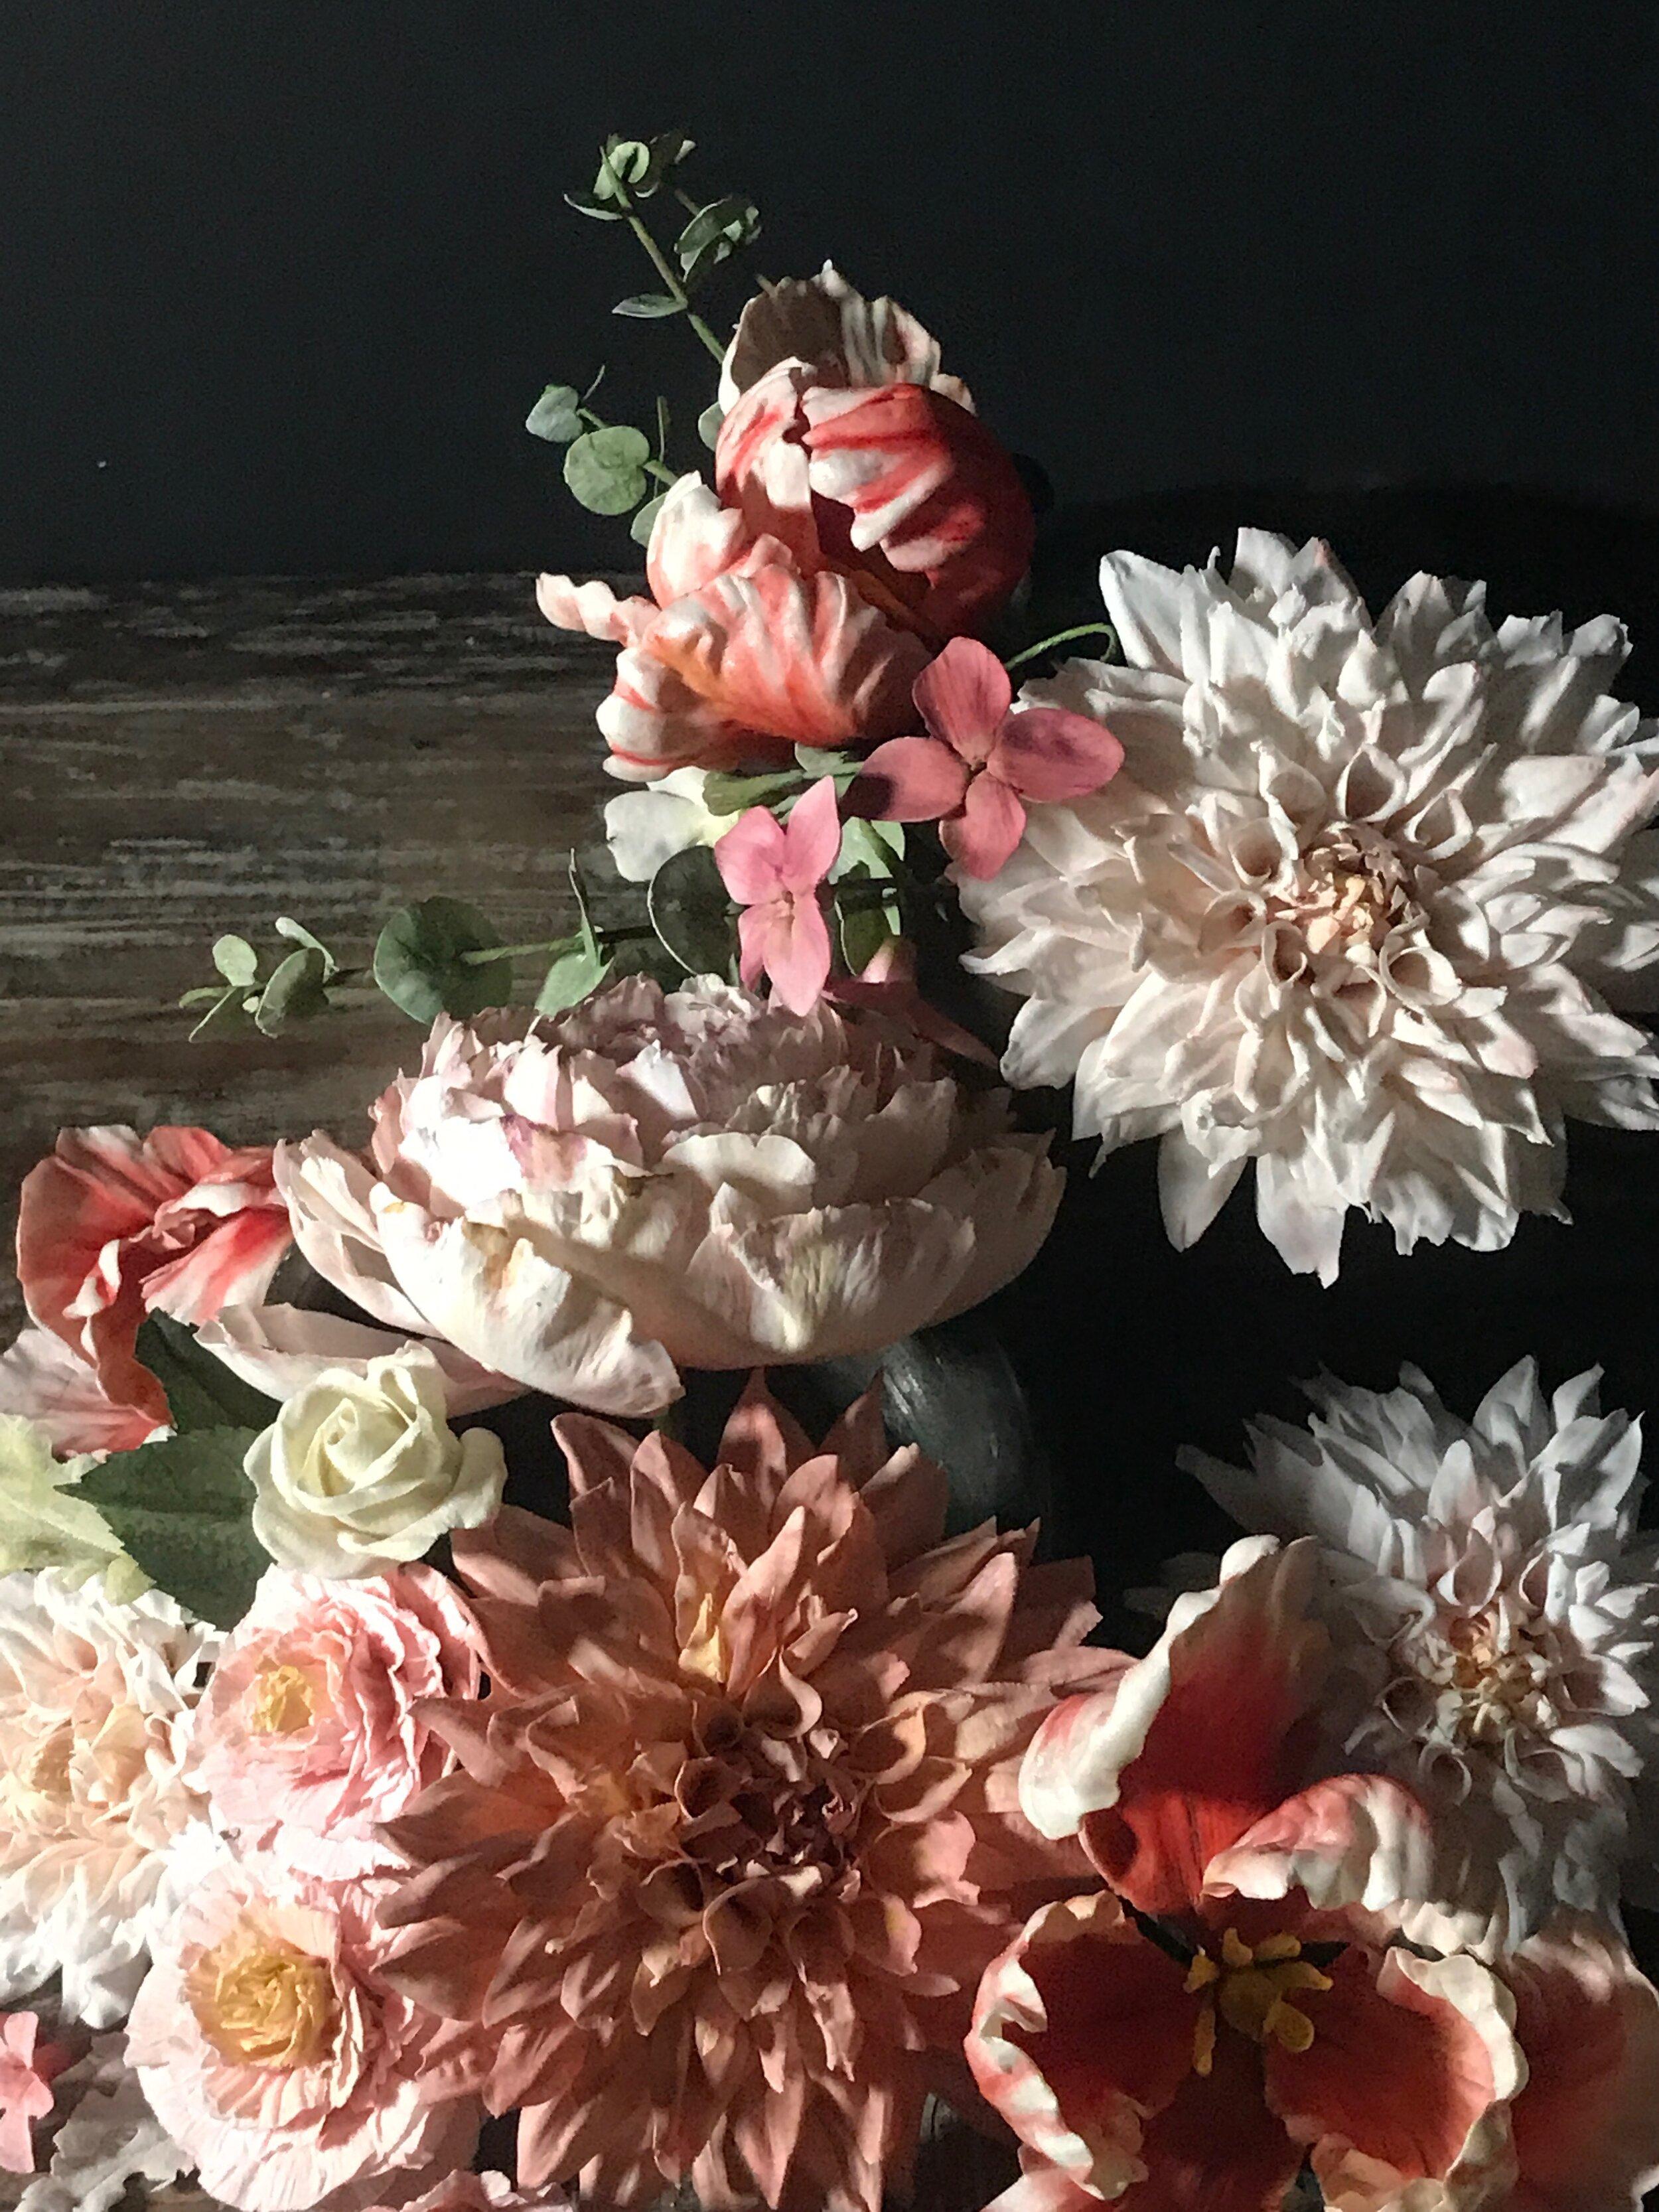 Fine Art Photo of Sugar Flowers